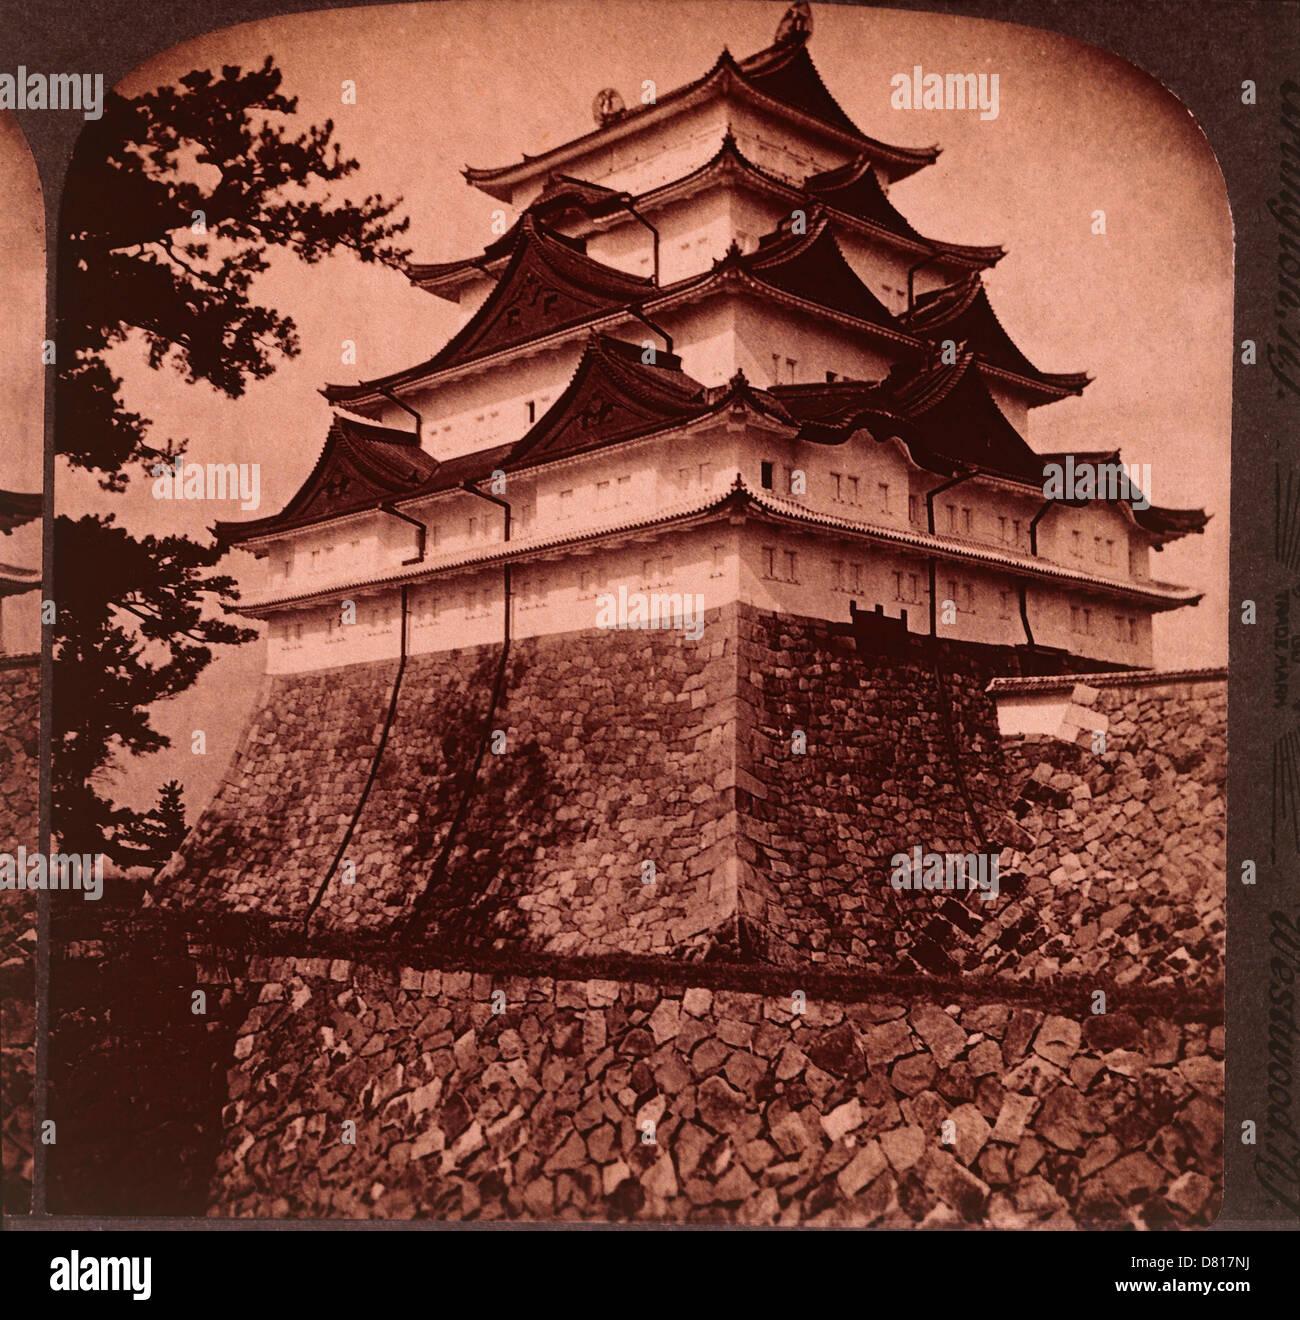 Mittelalterliche Königsschloss, Nagoya, Japan, ca. 1896 Stockbild